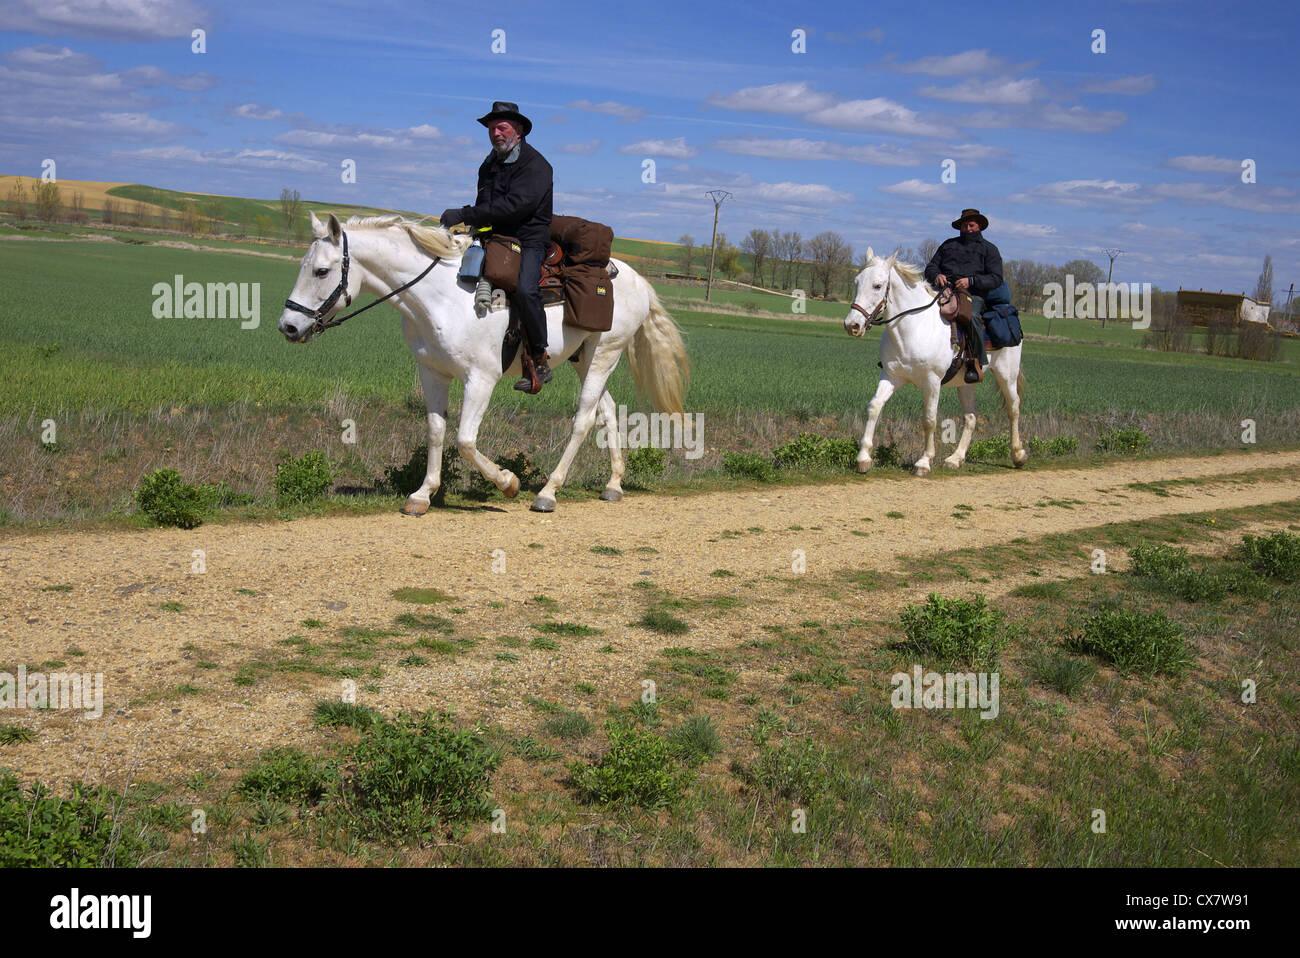 Two pilgrims on horseback en route to Santiago de Compostela, near Fromista, Spain. - Stock Image